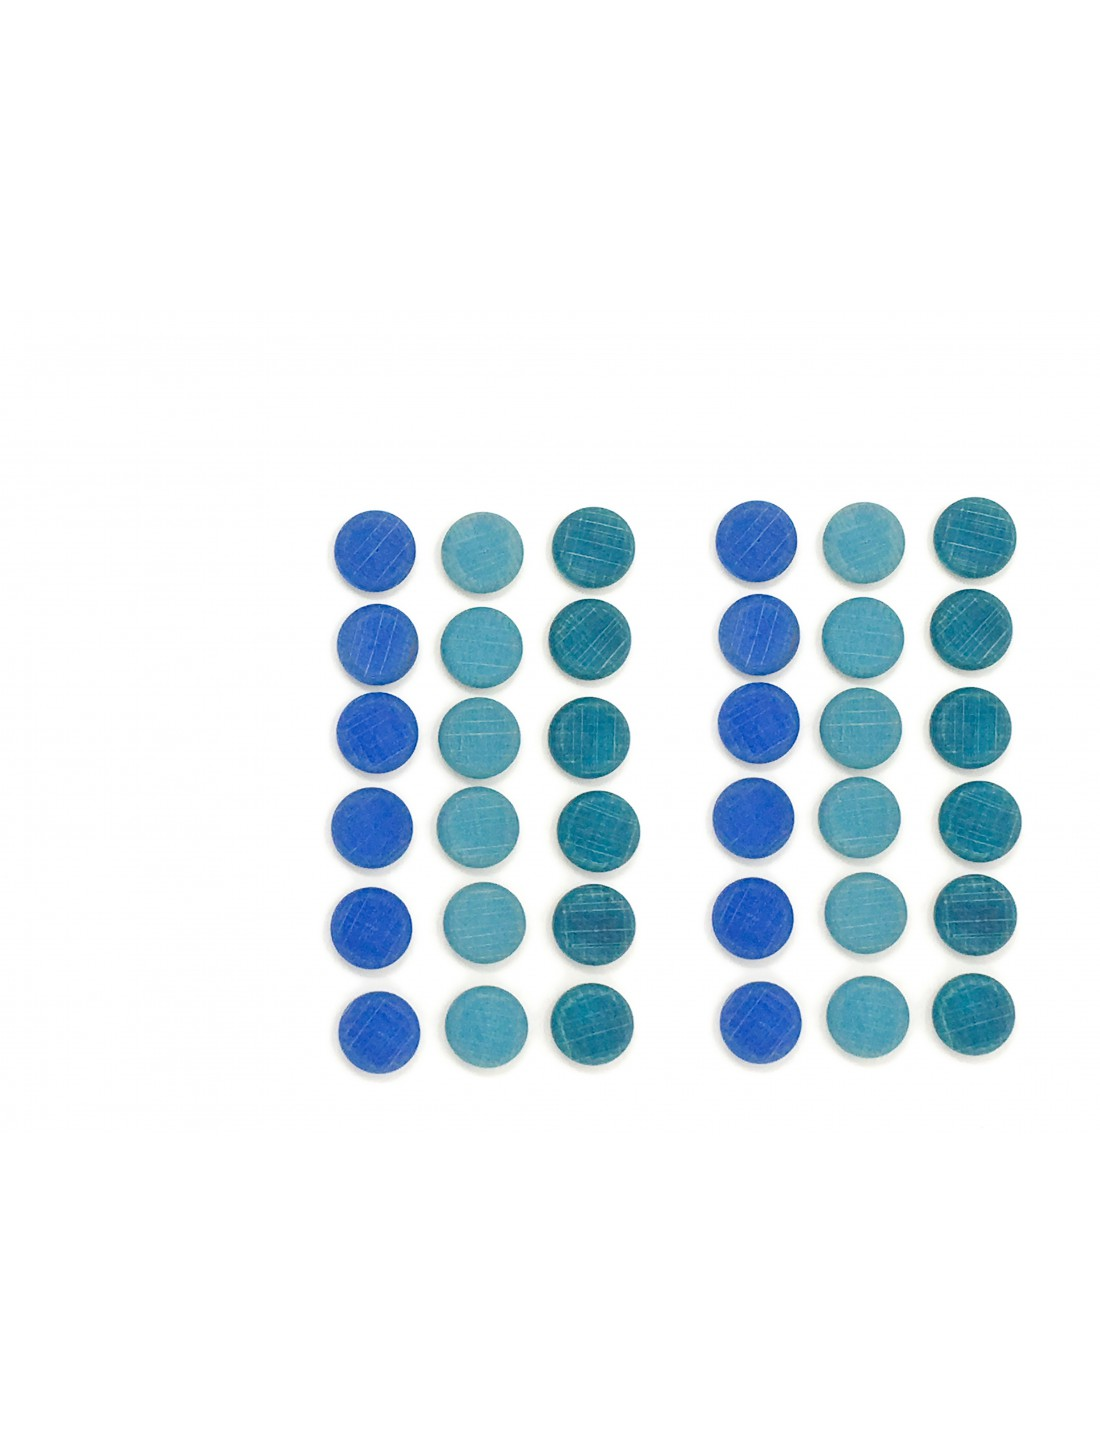 Mandala pequeñas monedas azules. Grapat